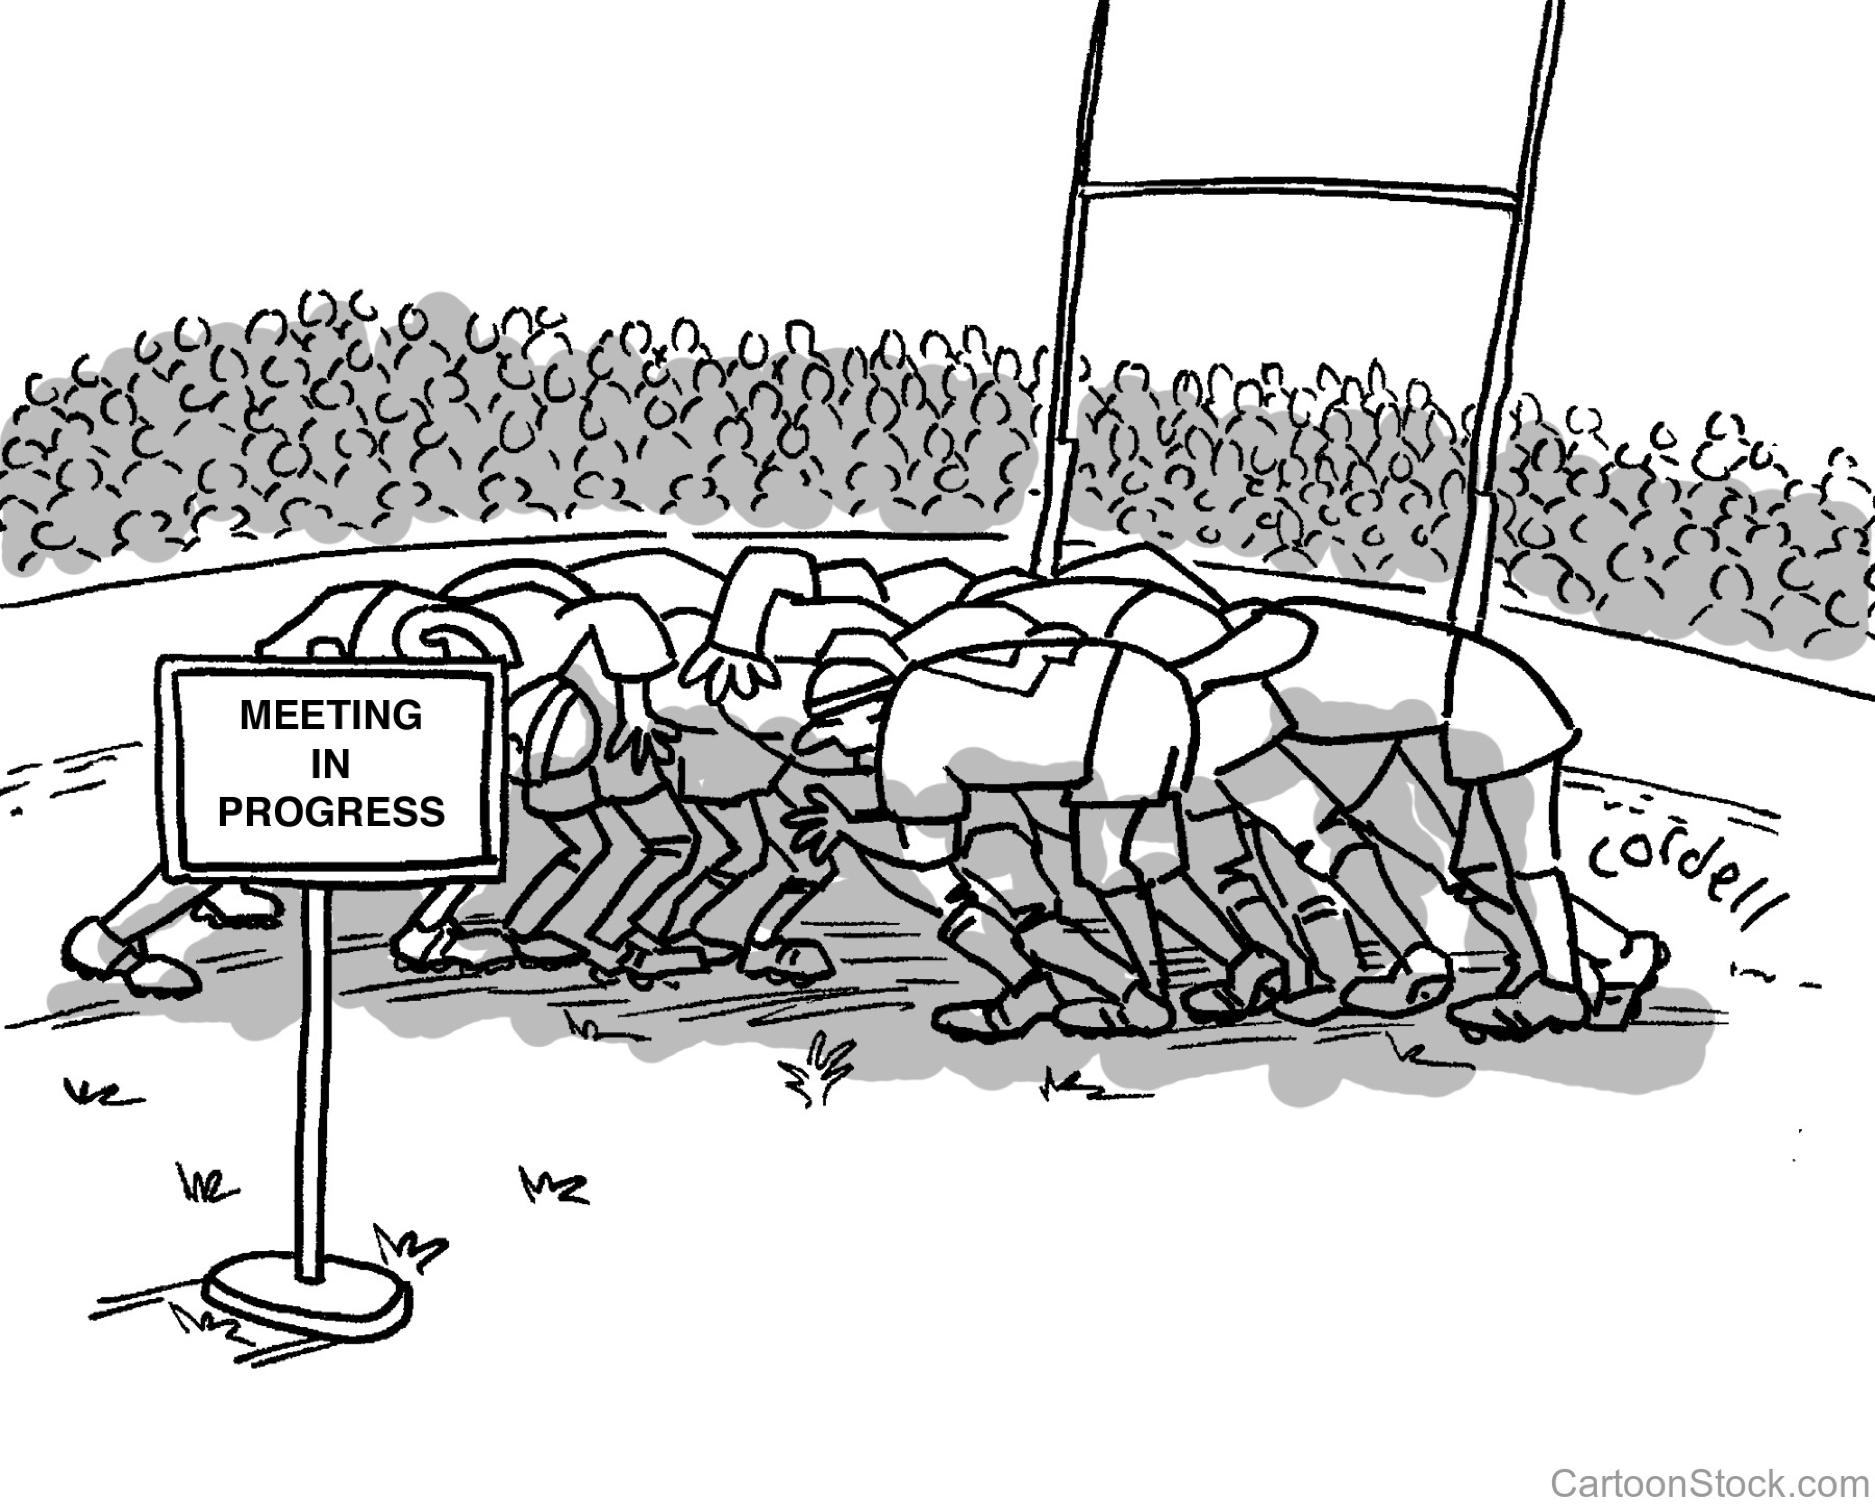 By Tim Cordell - CartoonStock